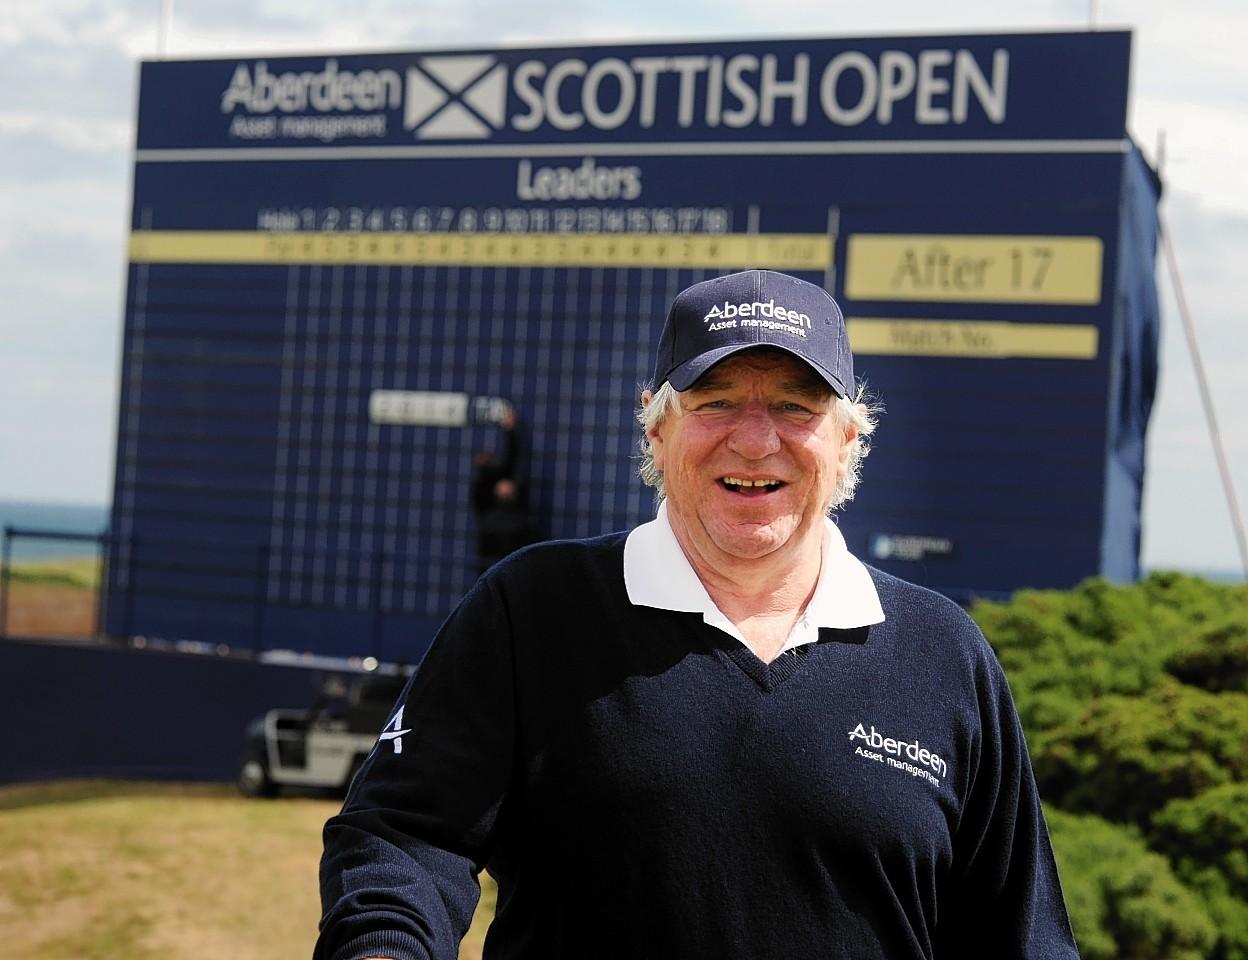 Martin Gilbert at the Scottish Open in Aberdeen